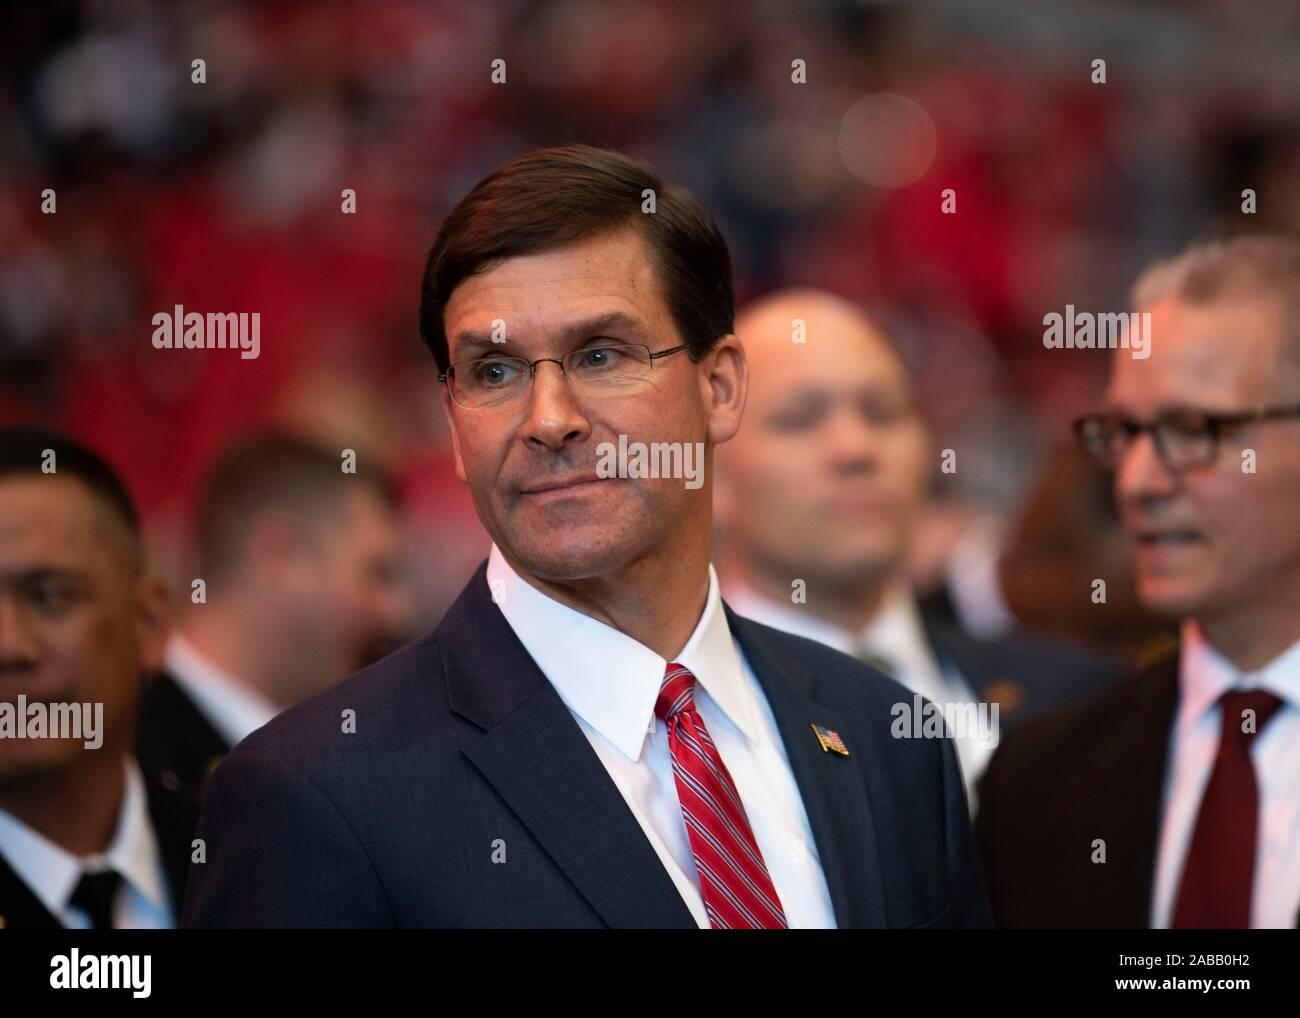 U.S Defense Secretary Mark Esper attends the Atlanta Falcons and Tampa Bay Buccaneers Salute to Service American football game November 24, 2019 n Atlanta, Georgia. Stock Photo